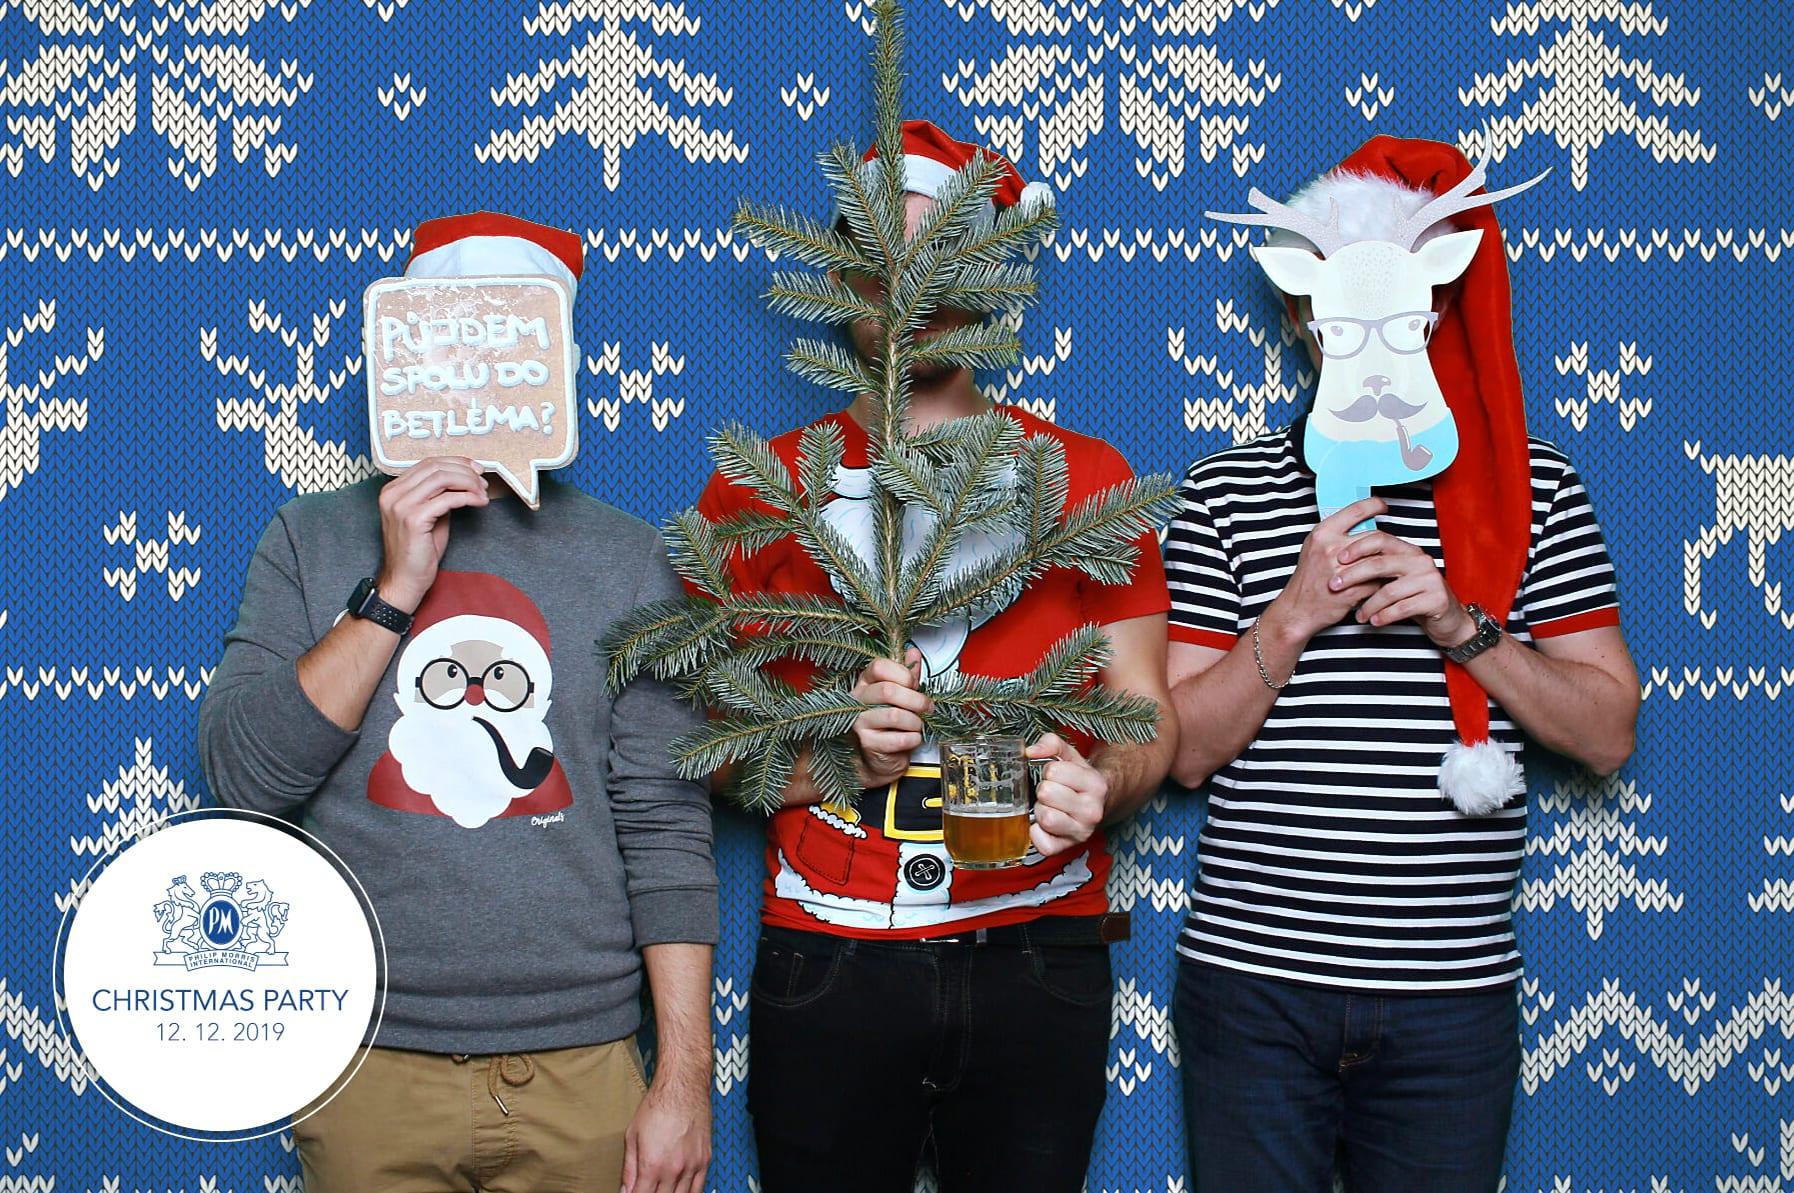 fotokoutek-vanocni-vecirek-philip-morris-christmas-party-12-12-2019-689838